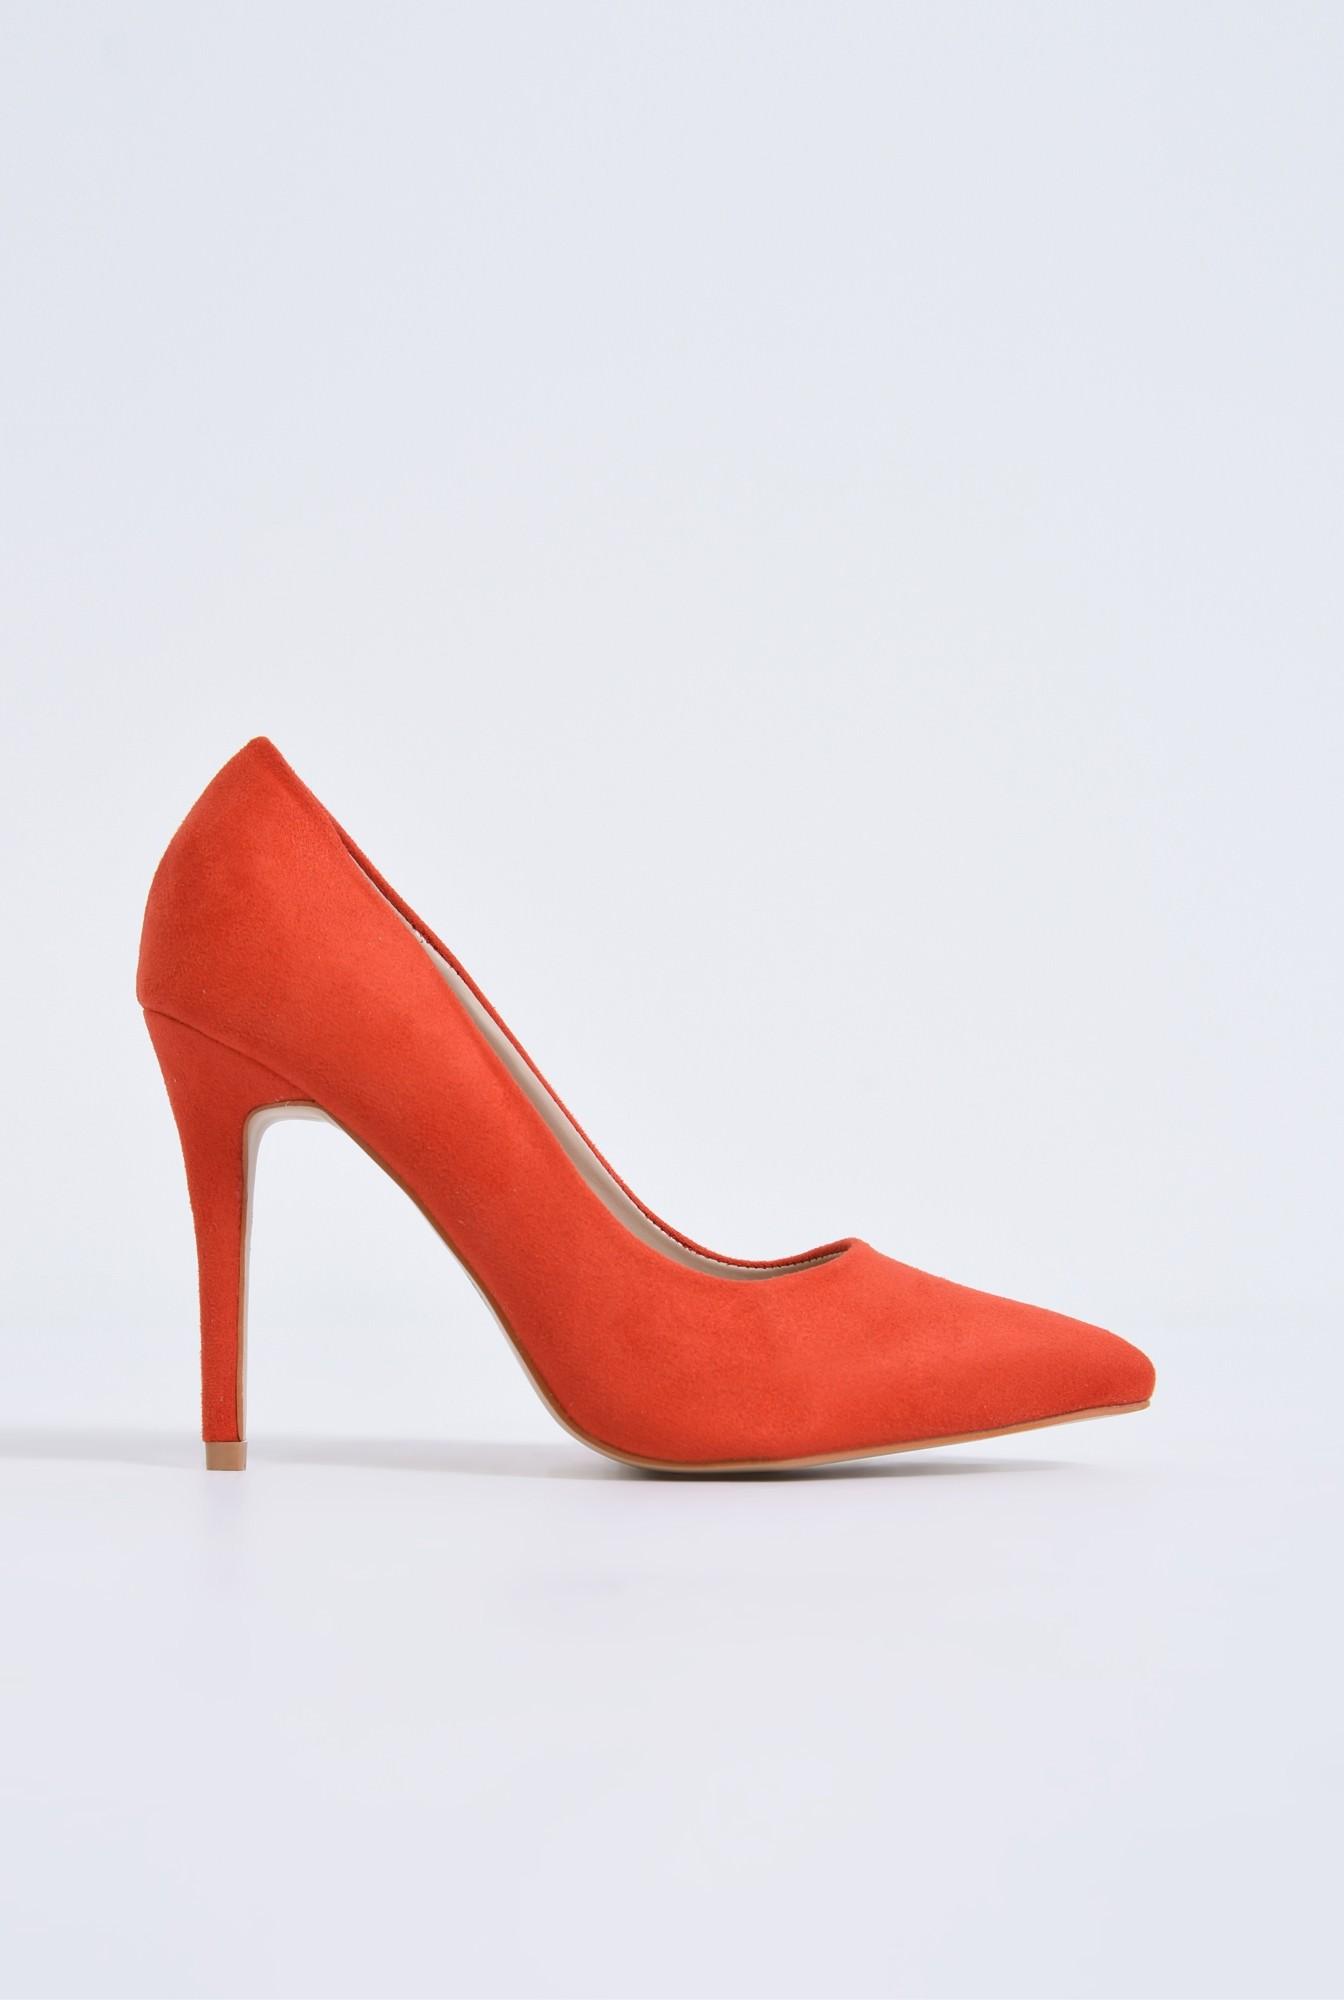 pantofi casual, rosu, stiletto